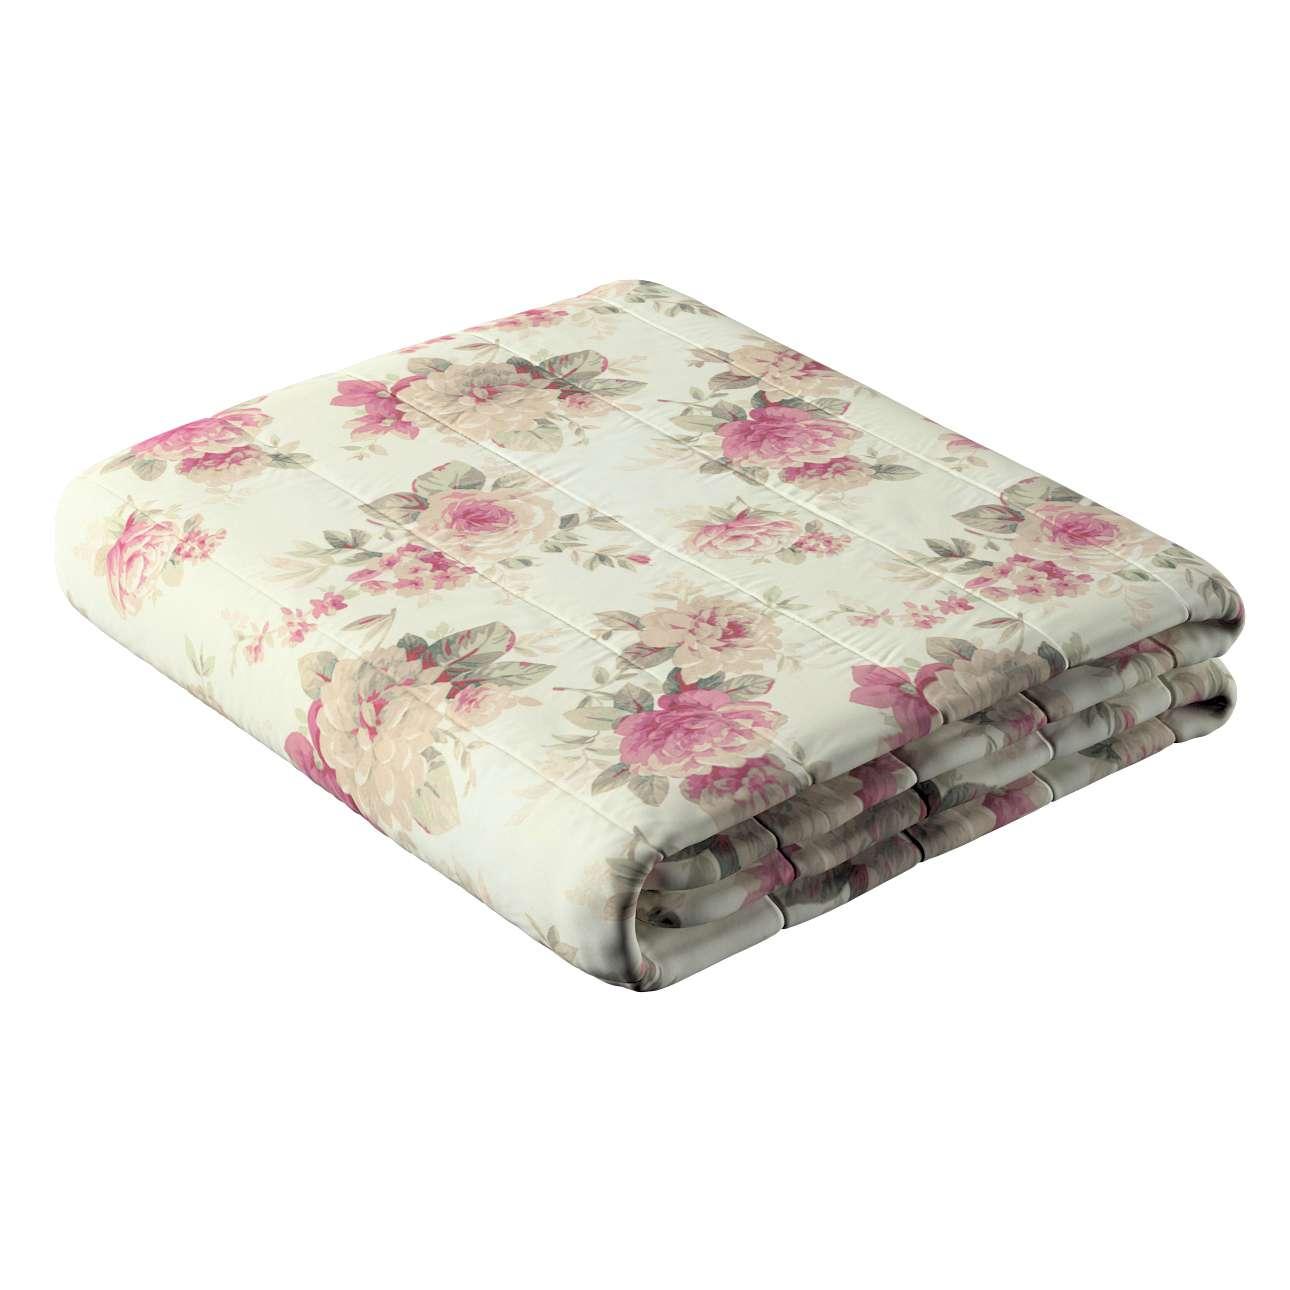 Narzuta pikowana w pasy w kolekcji Mirella, tkanina: 141-07